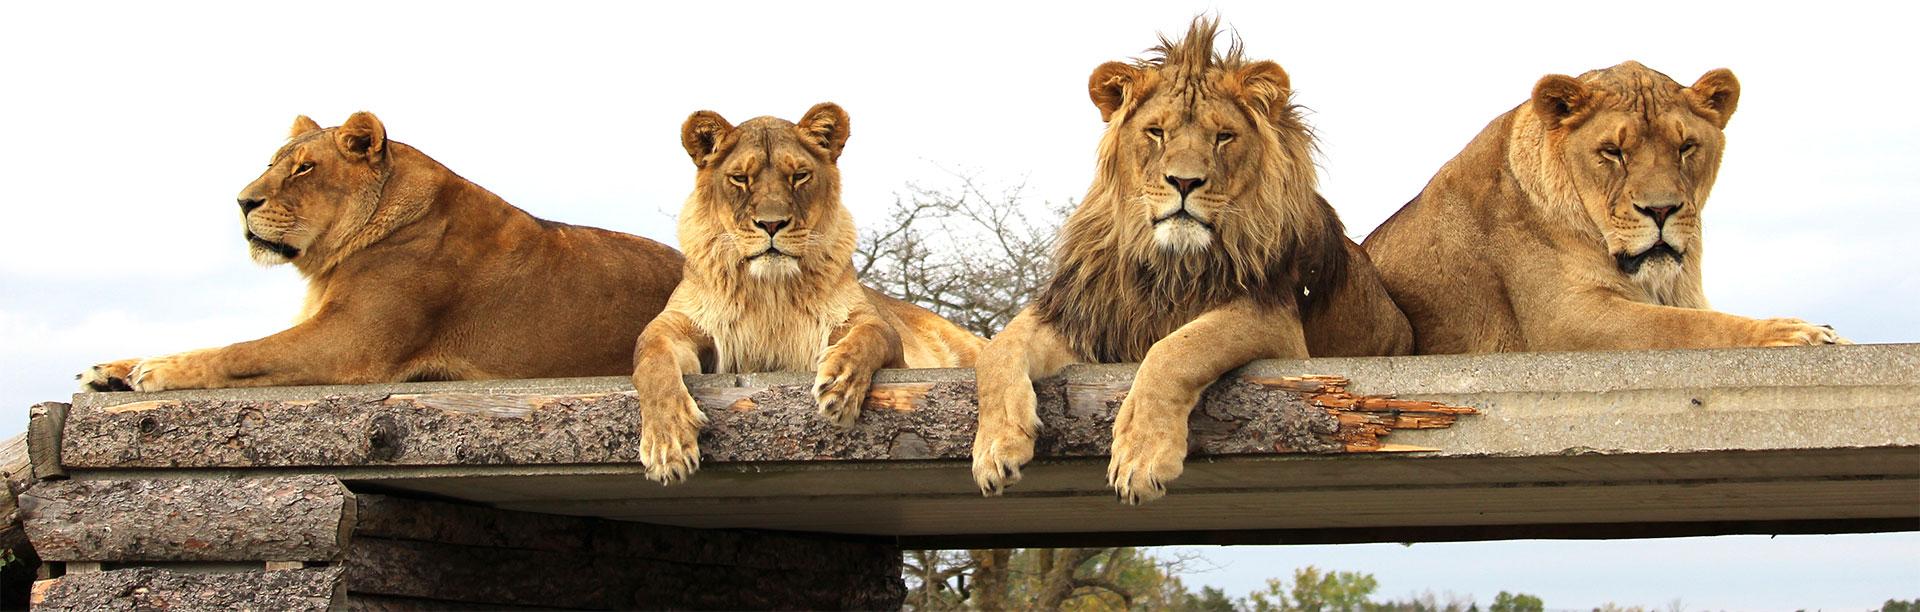 Tawney Lions